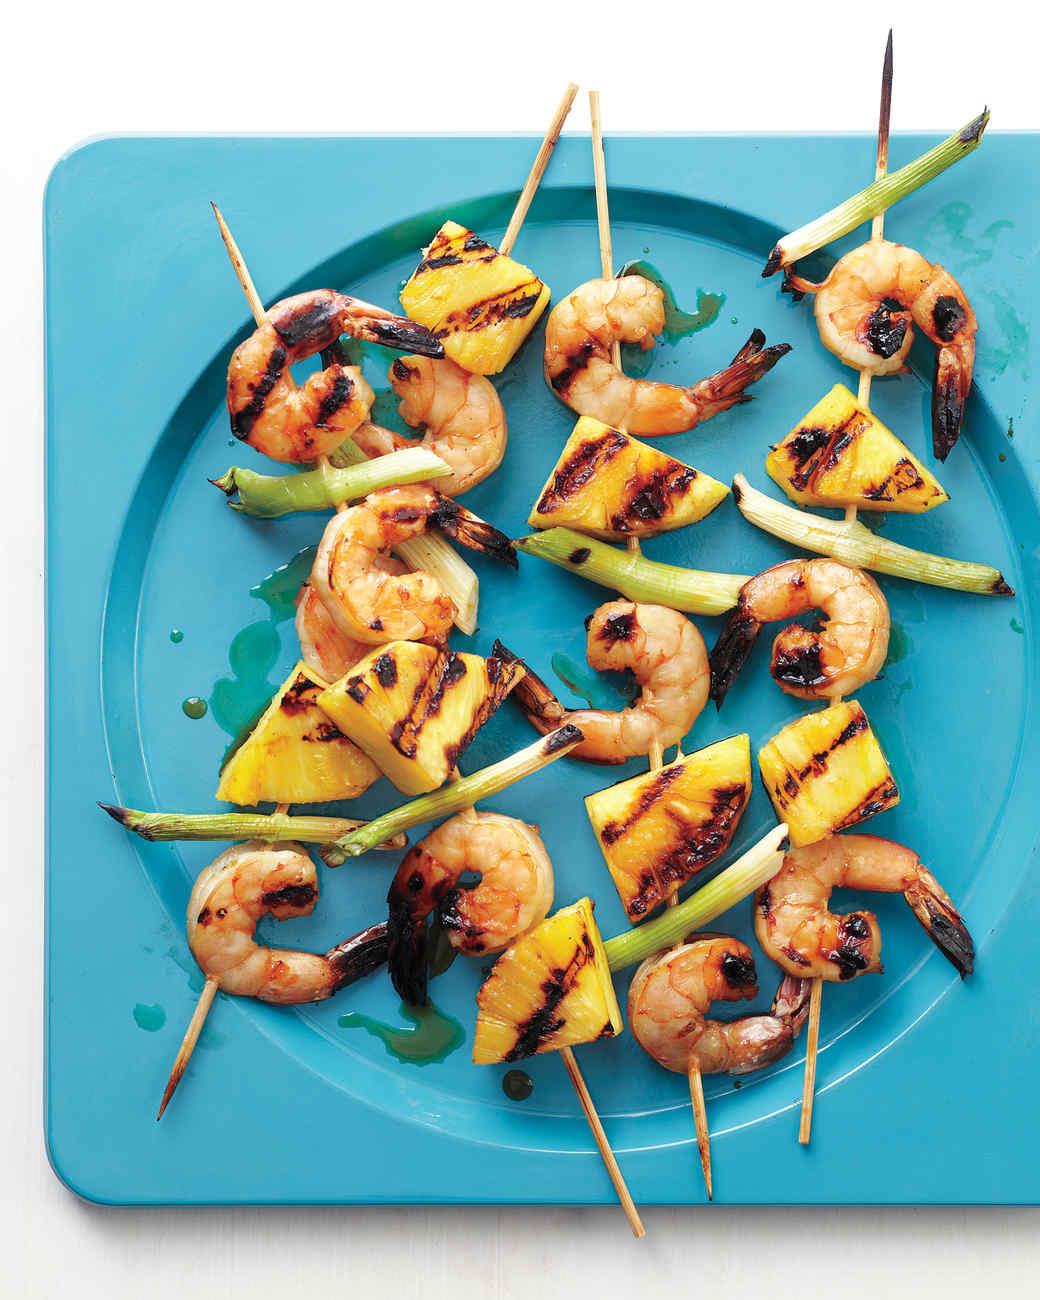 shrimp-skewers-med108462.jpg